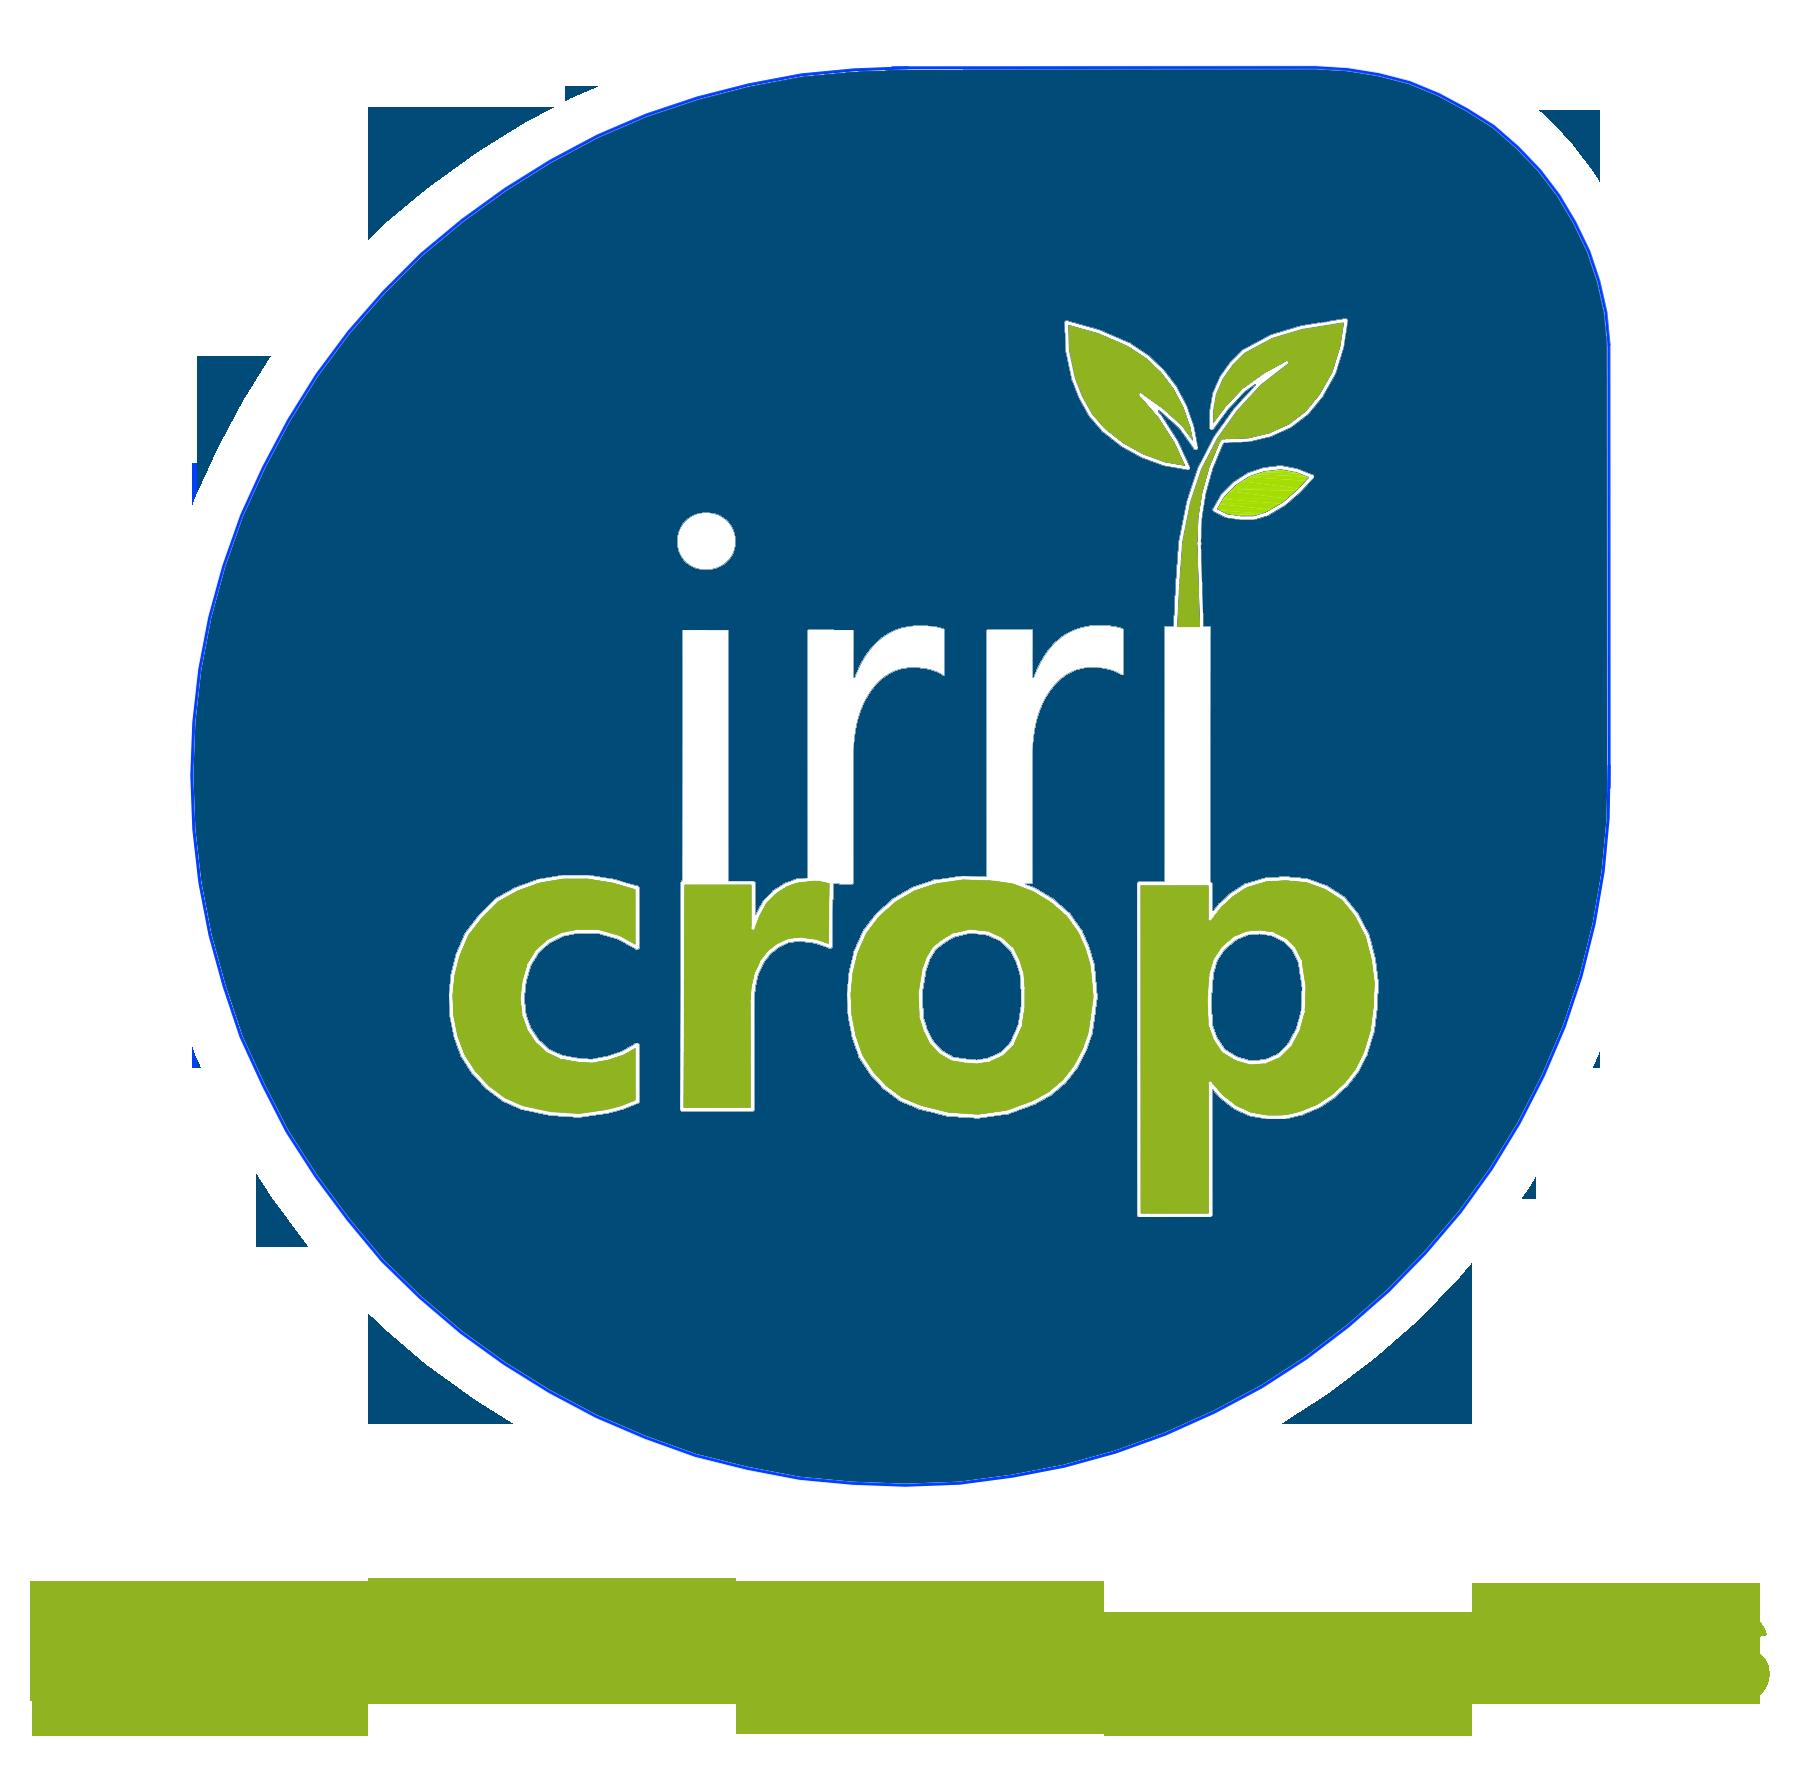 IrriCrop